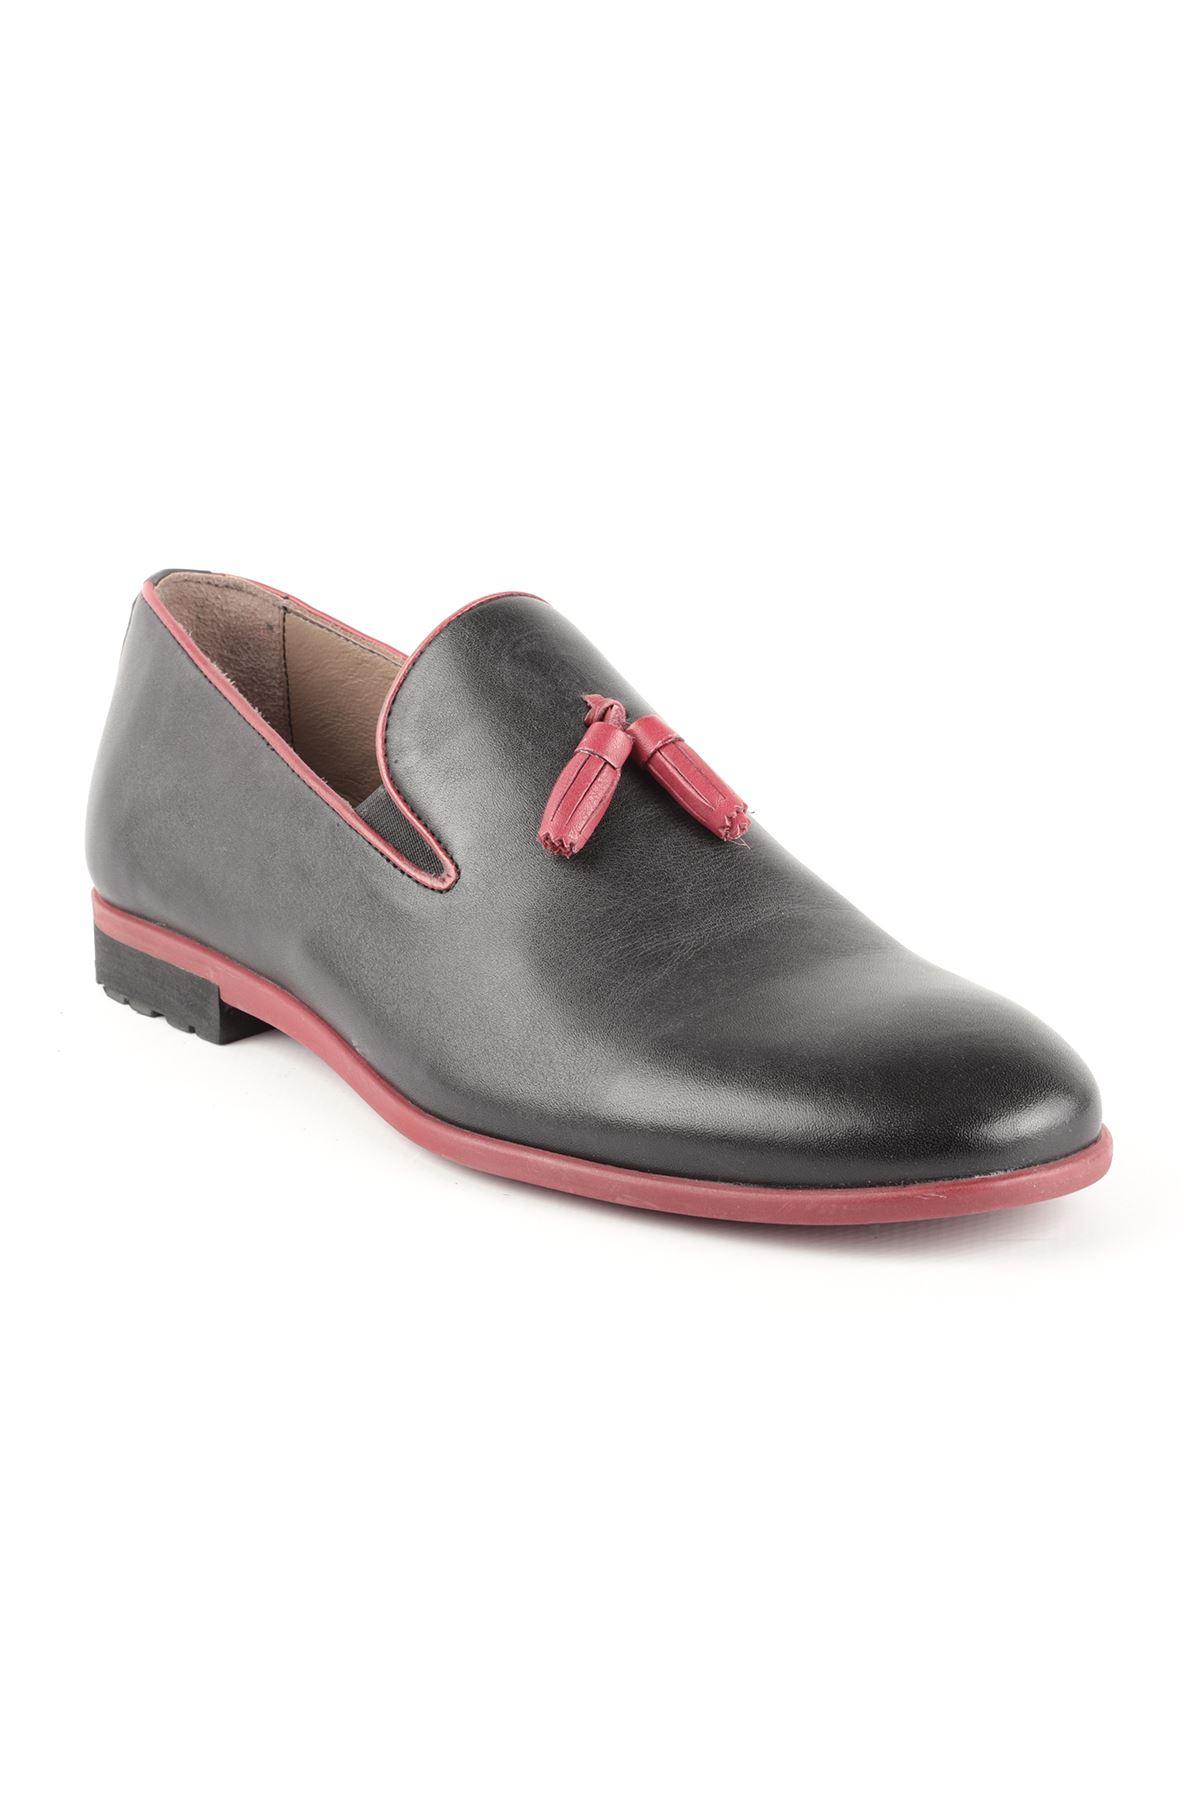 Libero T1434 Black Oxford Shoes